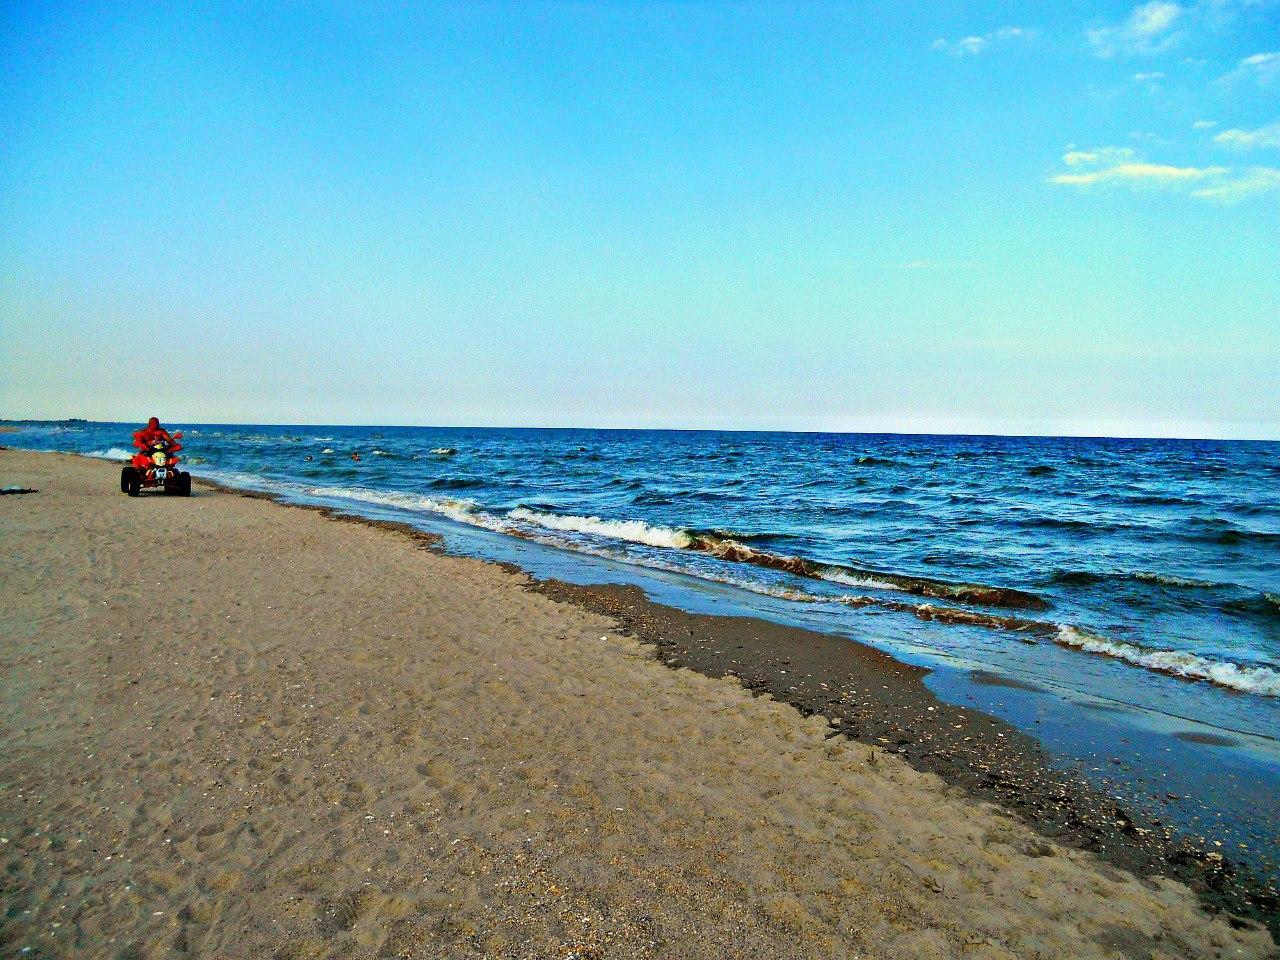 База отдыха Алекс Фото № 15 курорт Приморское 2016 год